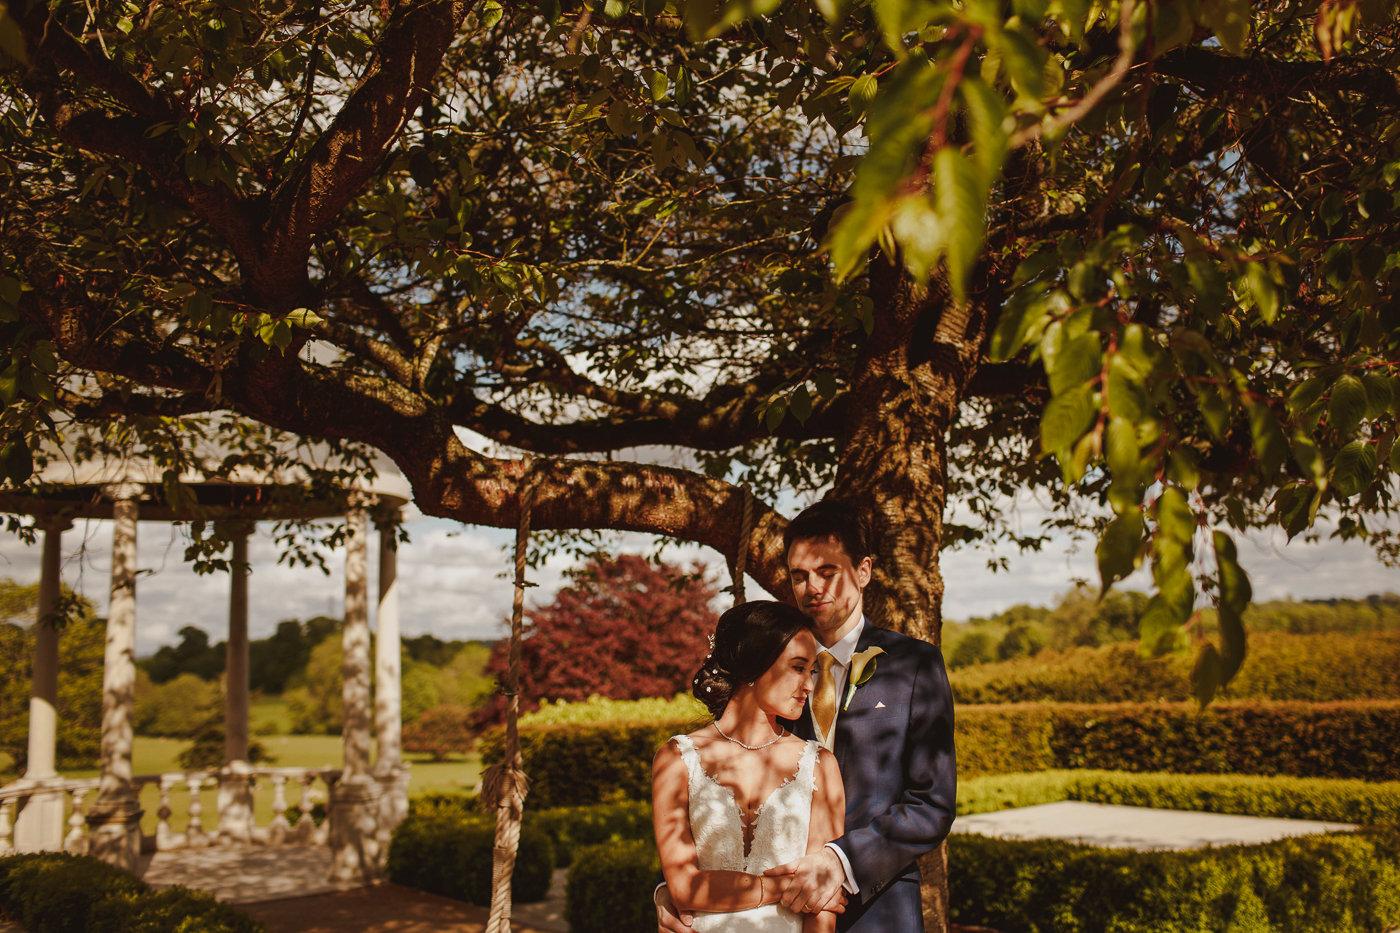 froyle-park-wedding-photography-34.jpg